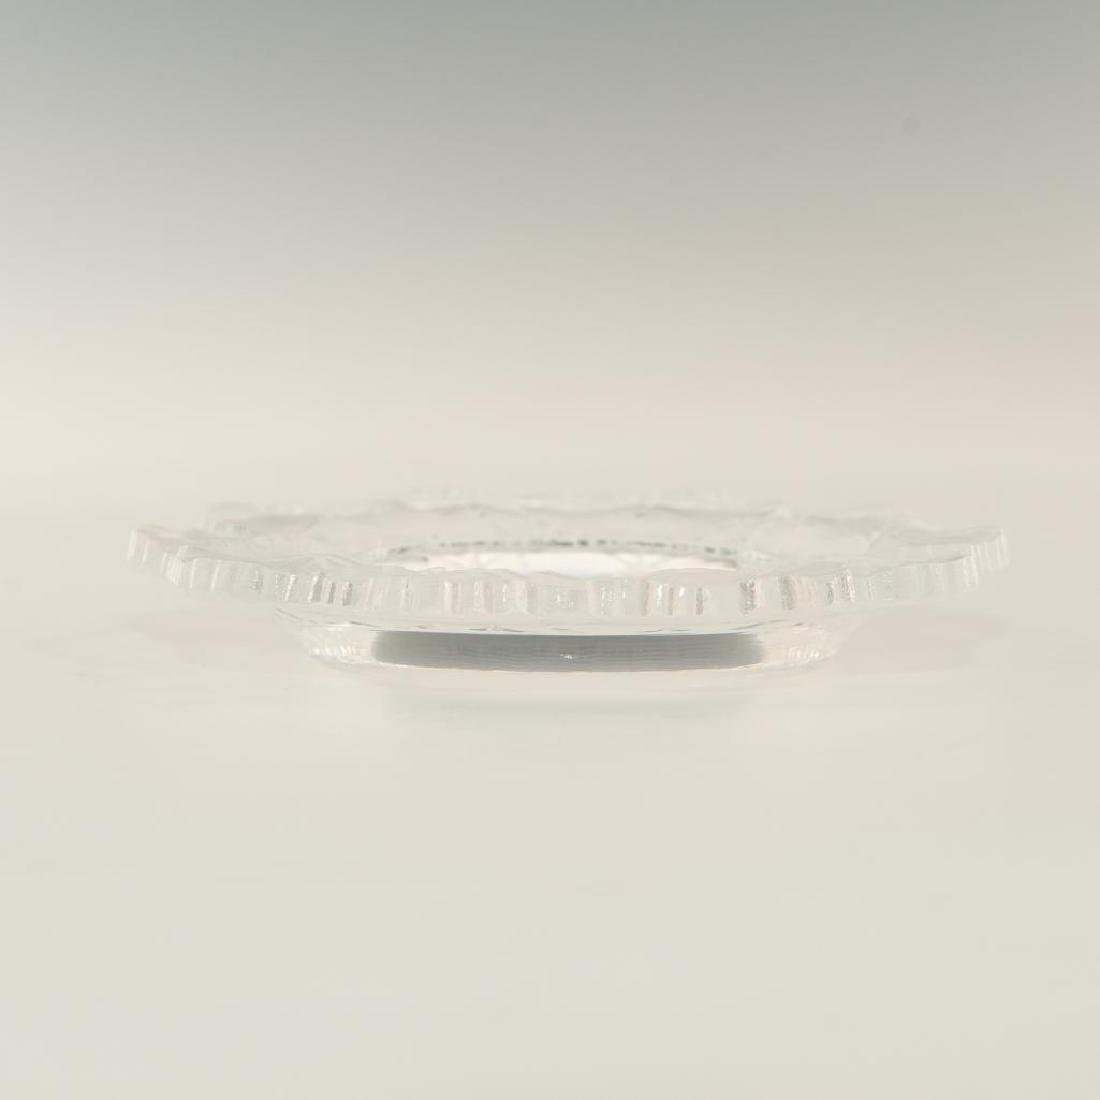 LALIQUE CRYSTAL HONFLEUR BOWL DISH PLATE ASHTRAY - 3